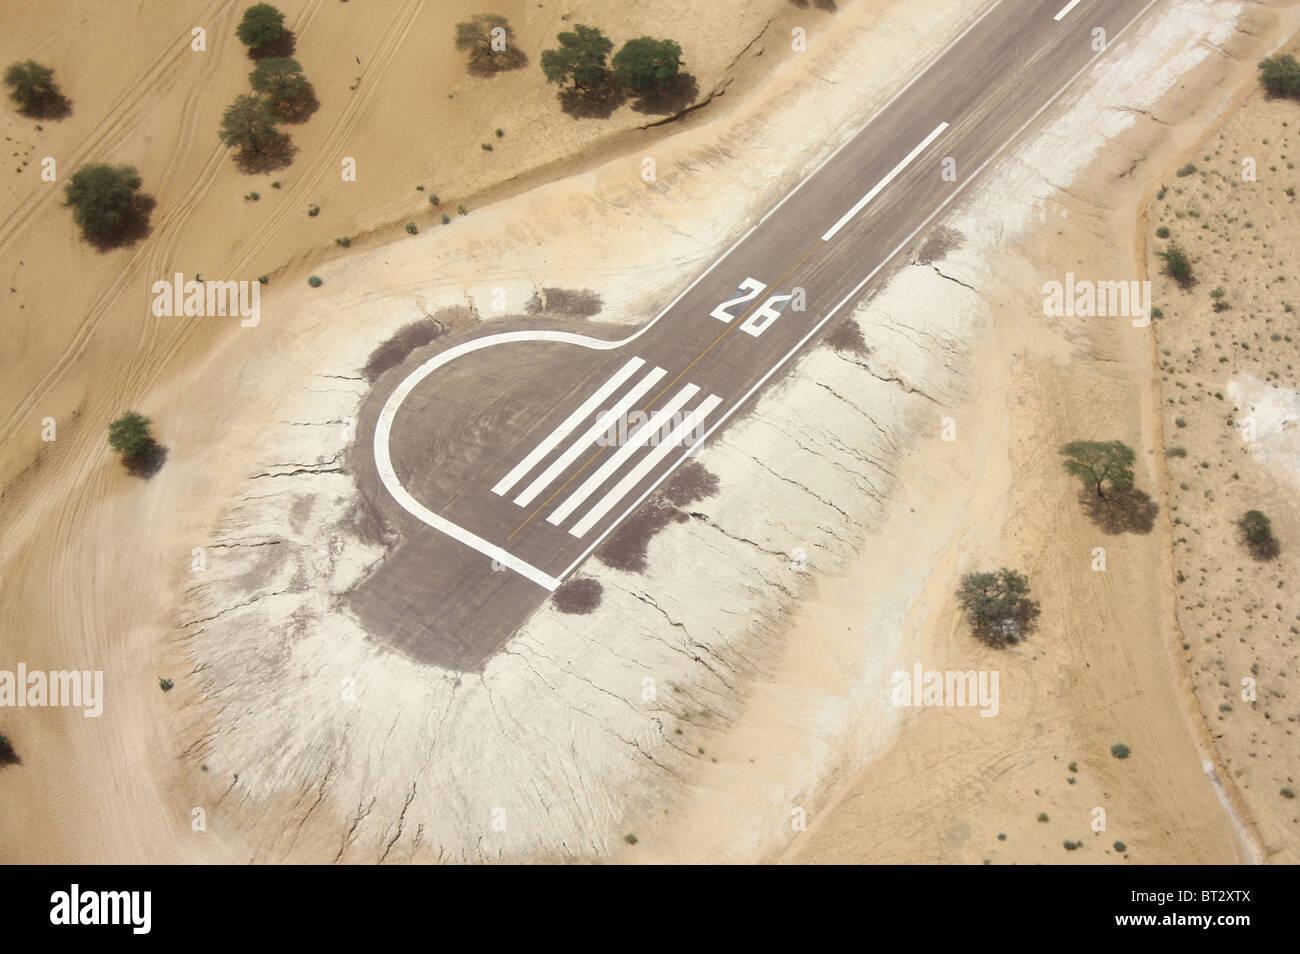 AIRSTRIP RUNWAY IN CHAD DESERT MAO - Stock Image